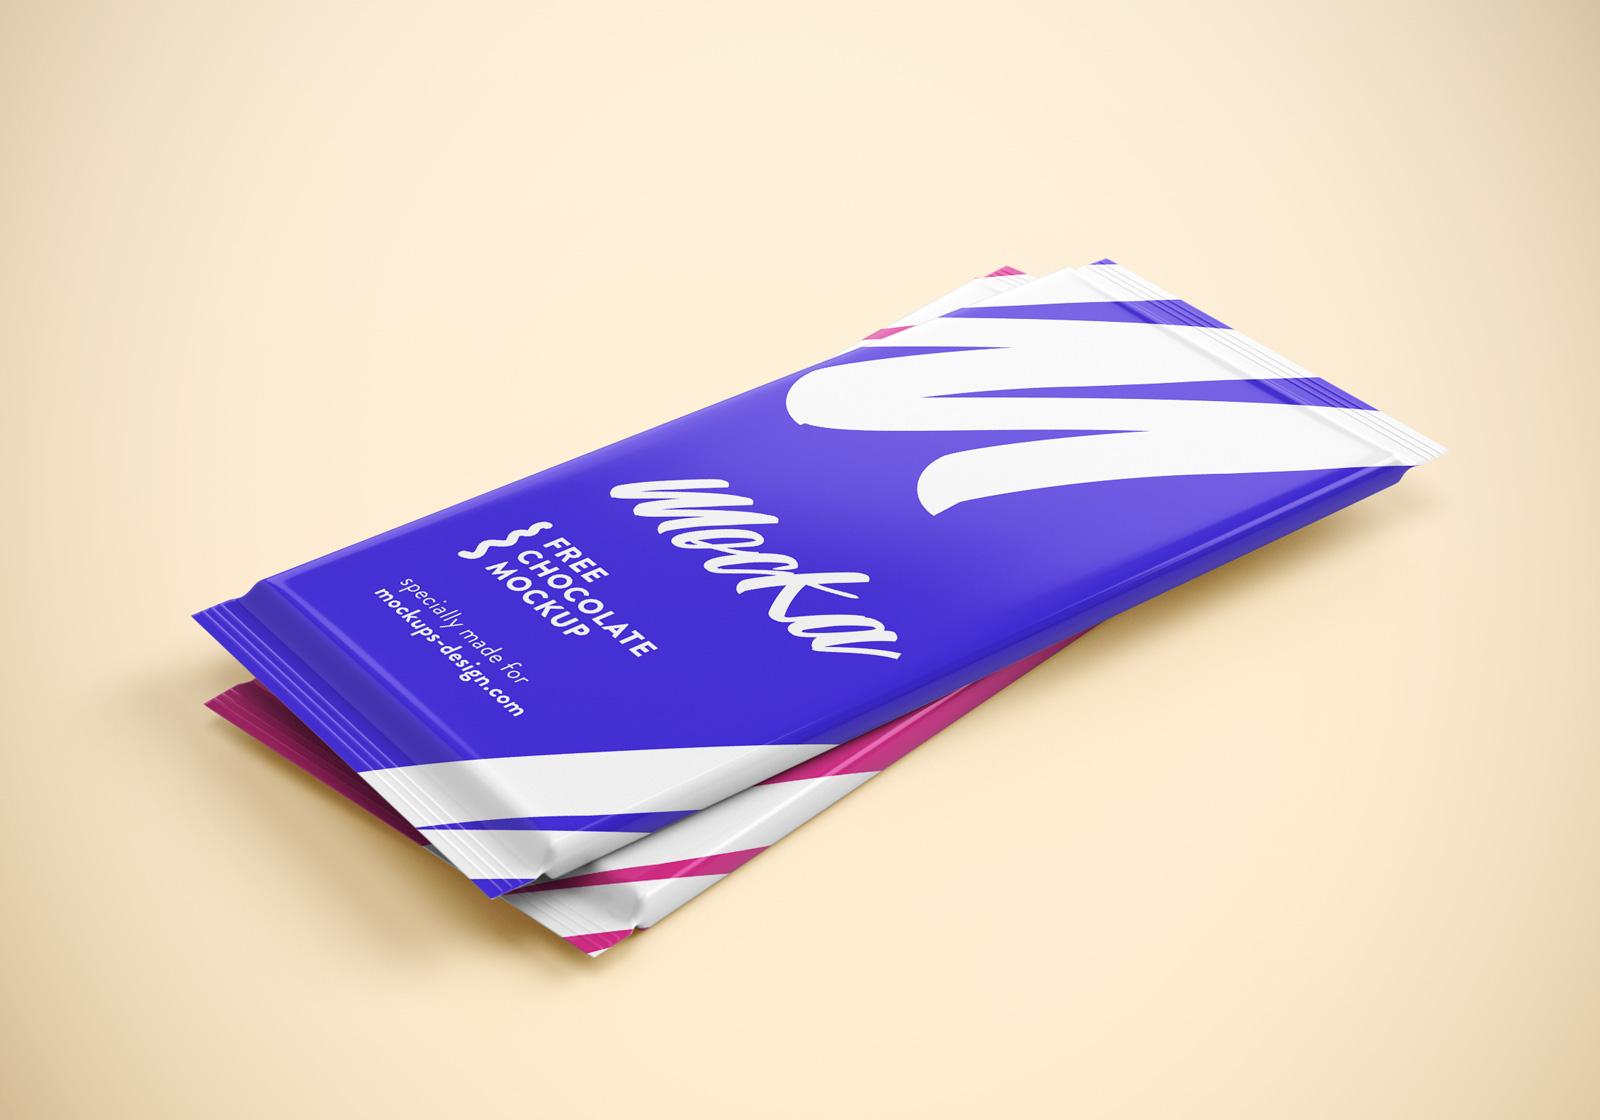 Free-Chocolate-Bar-Packaging-Mockup-PSD-3